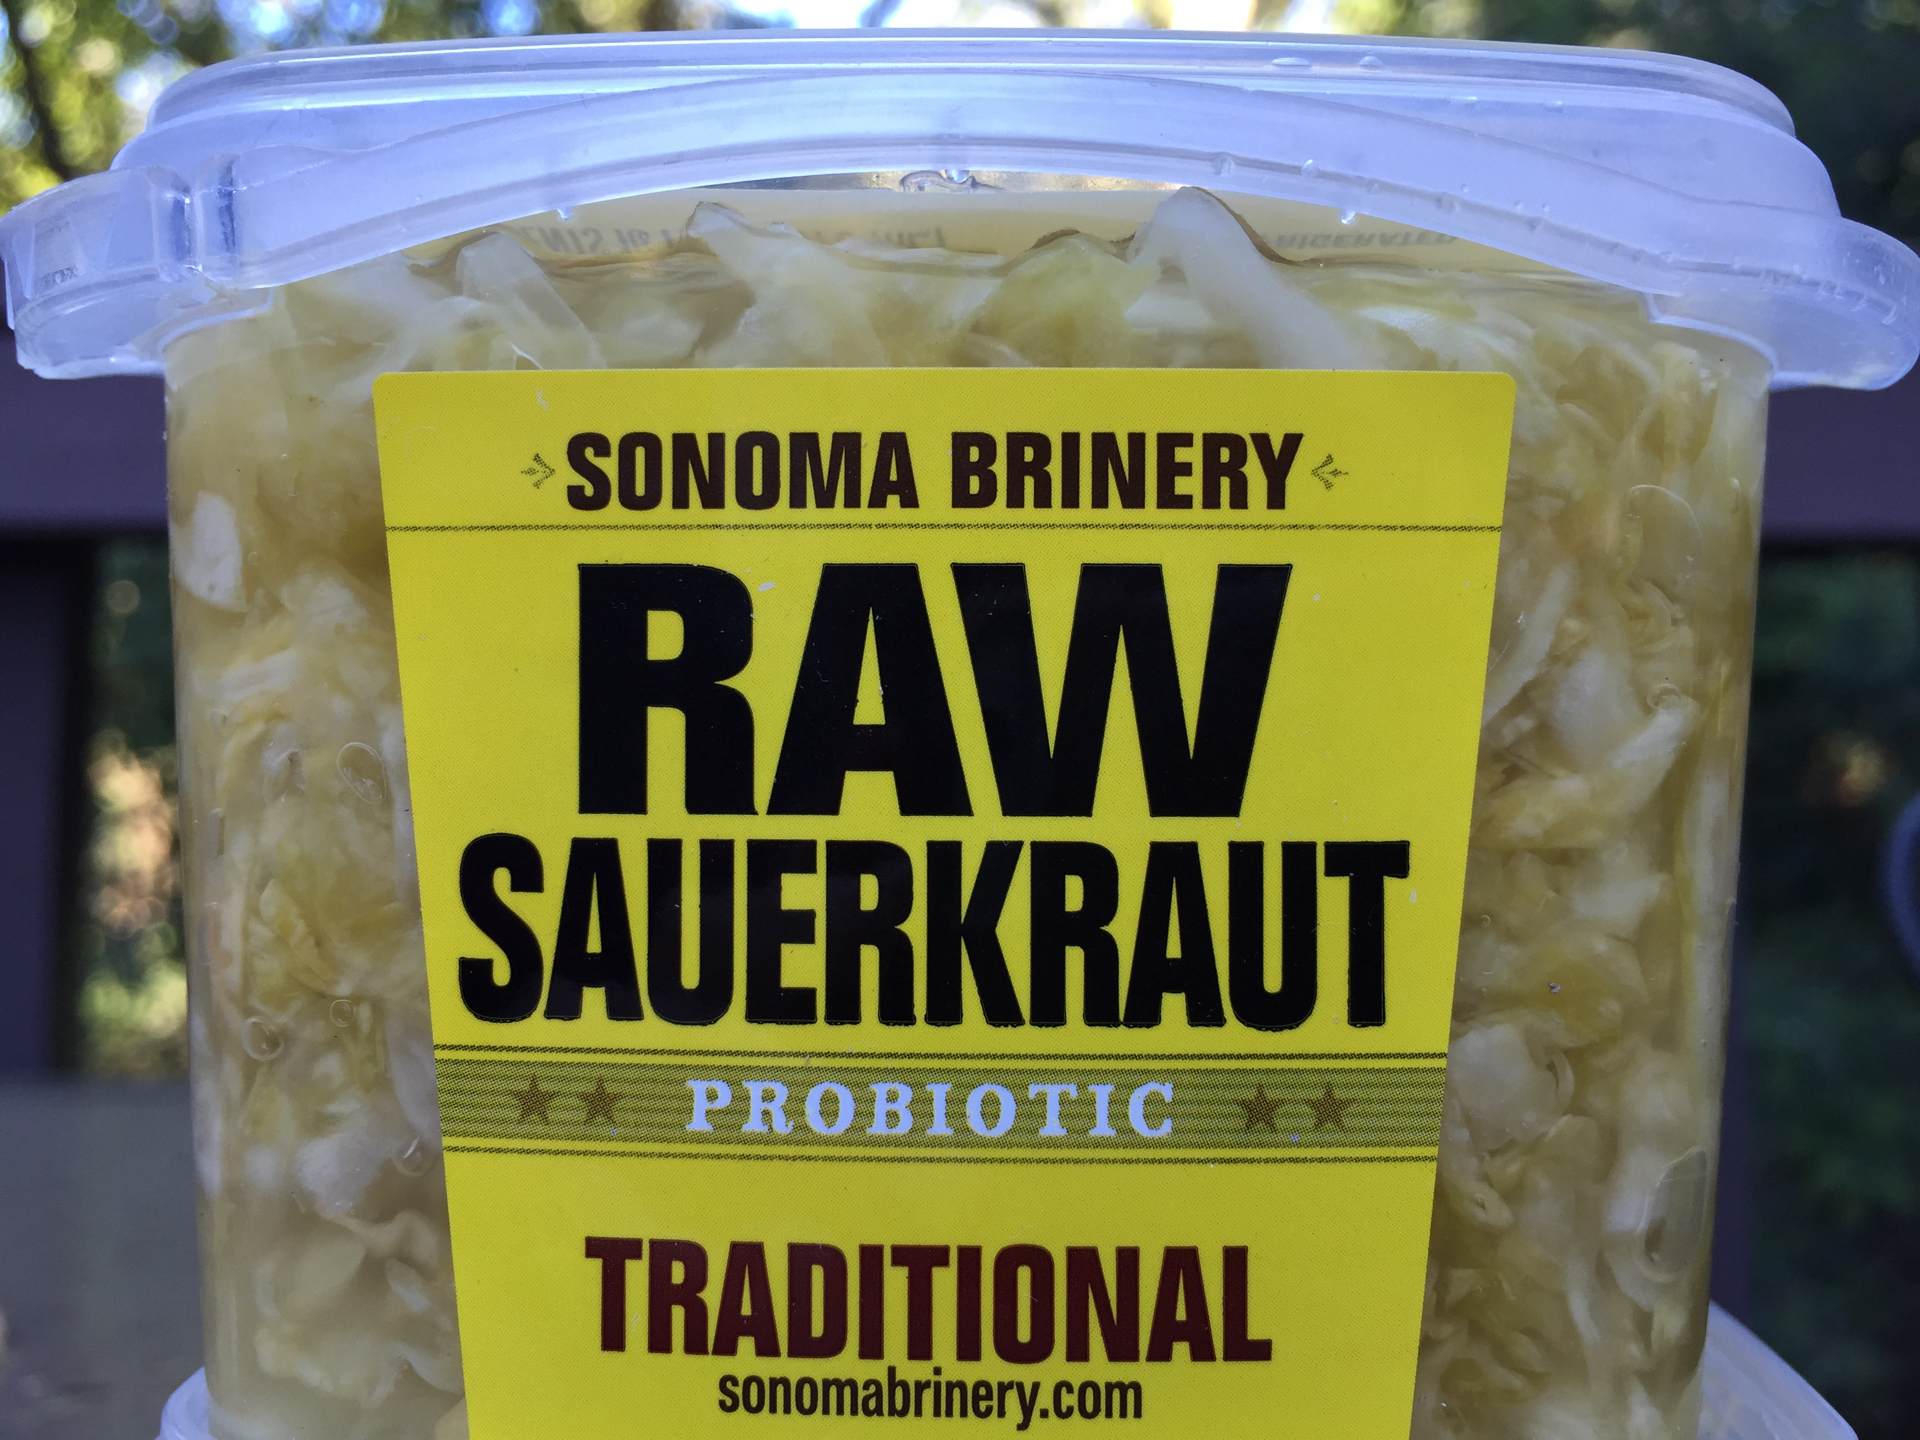 Sonoma Brinery's Raw Sauerkraut.